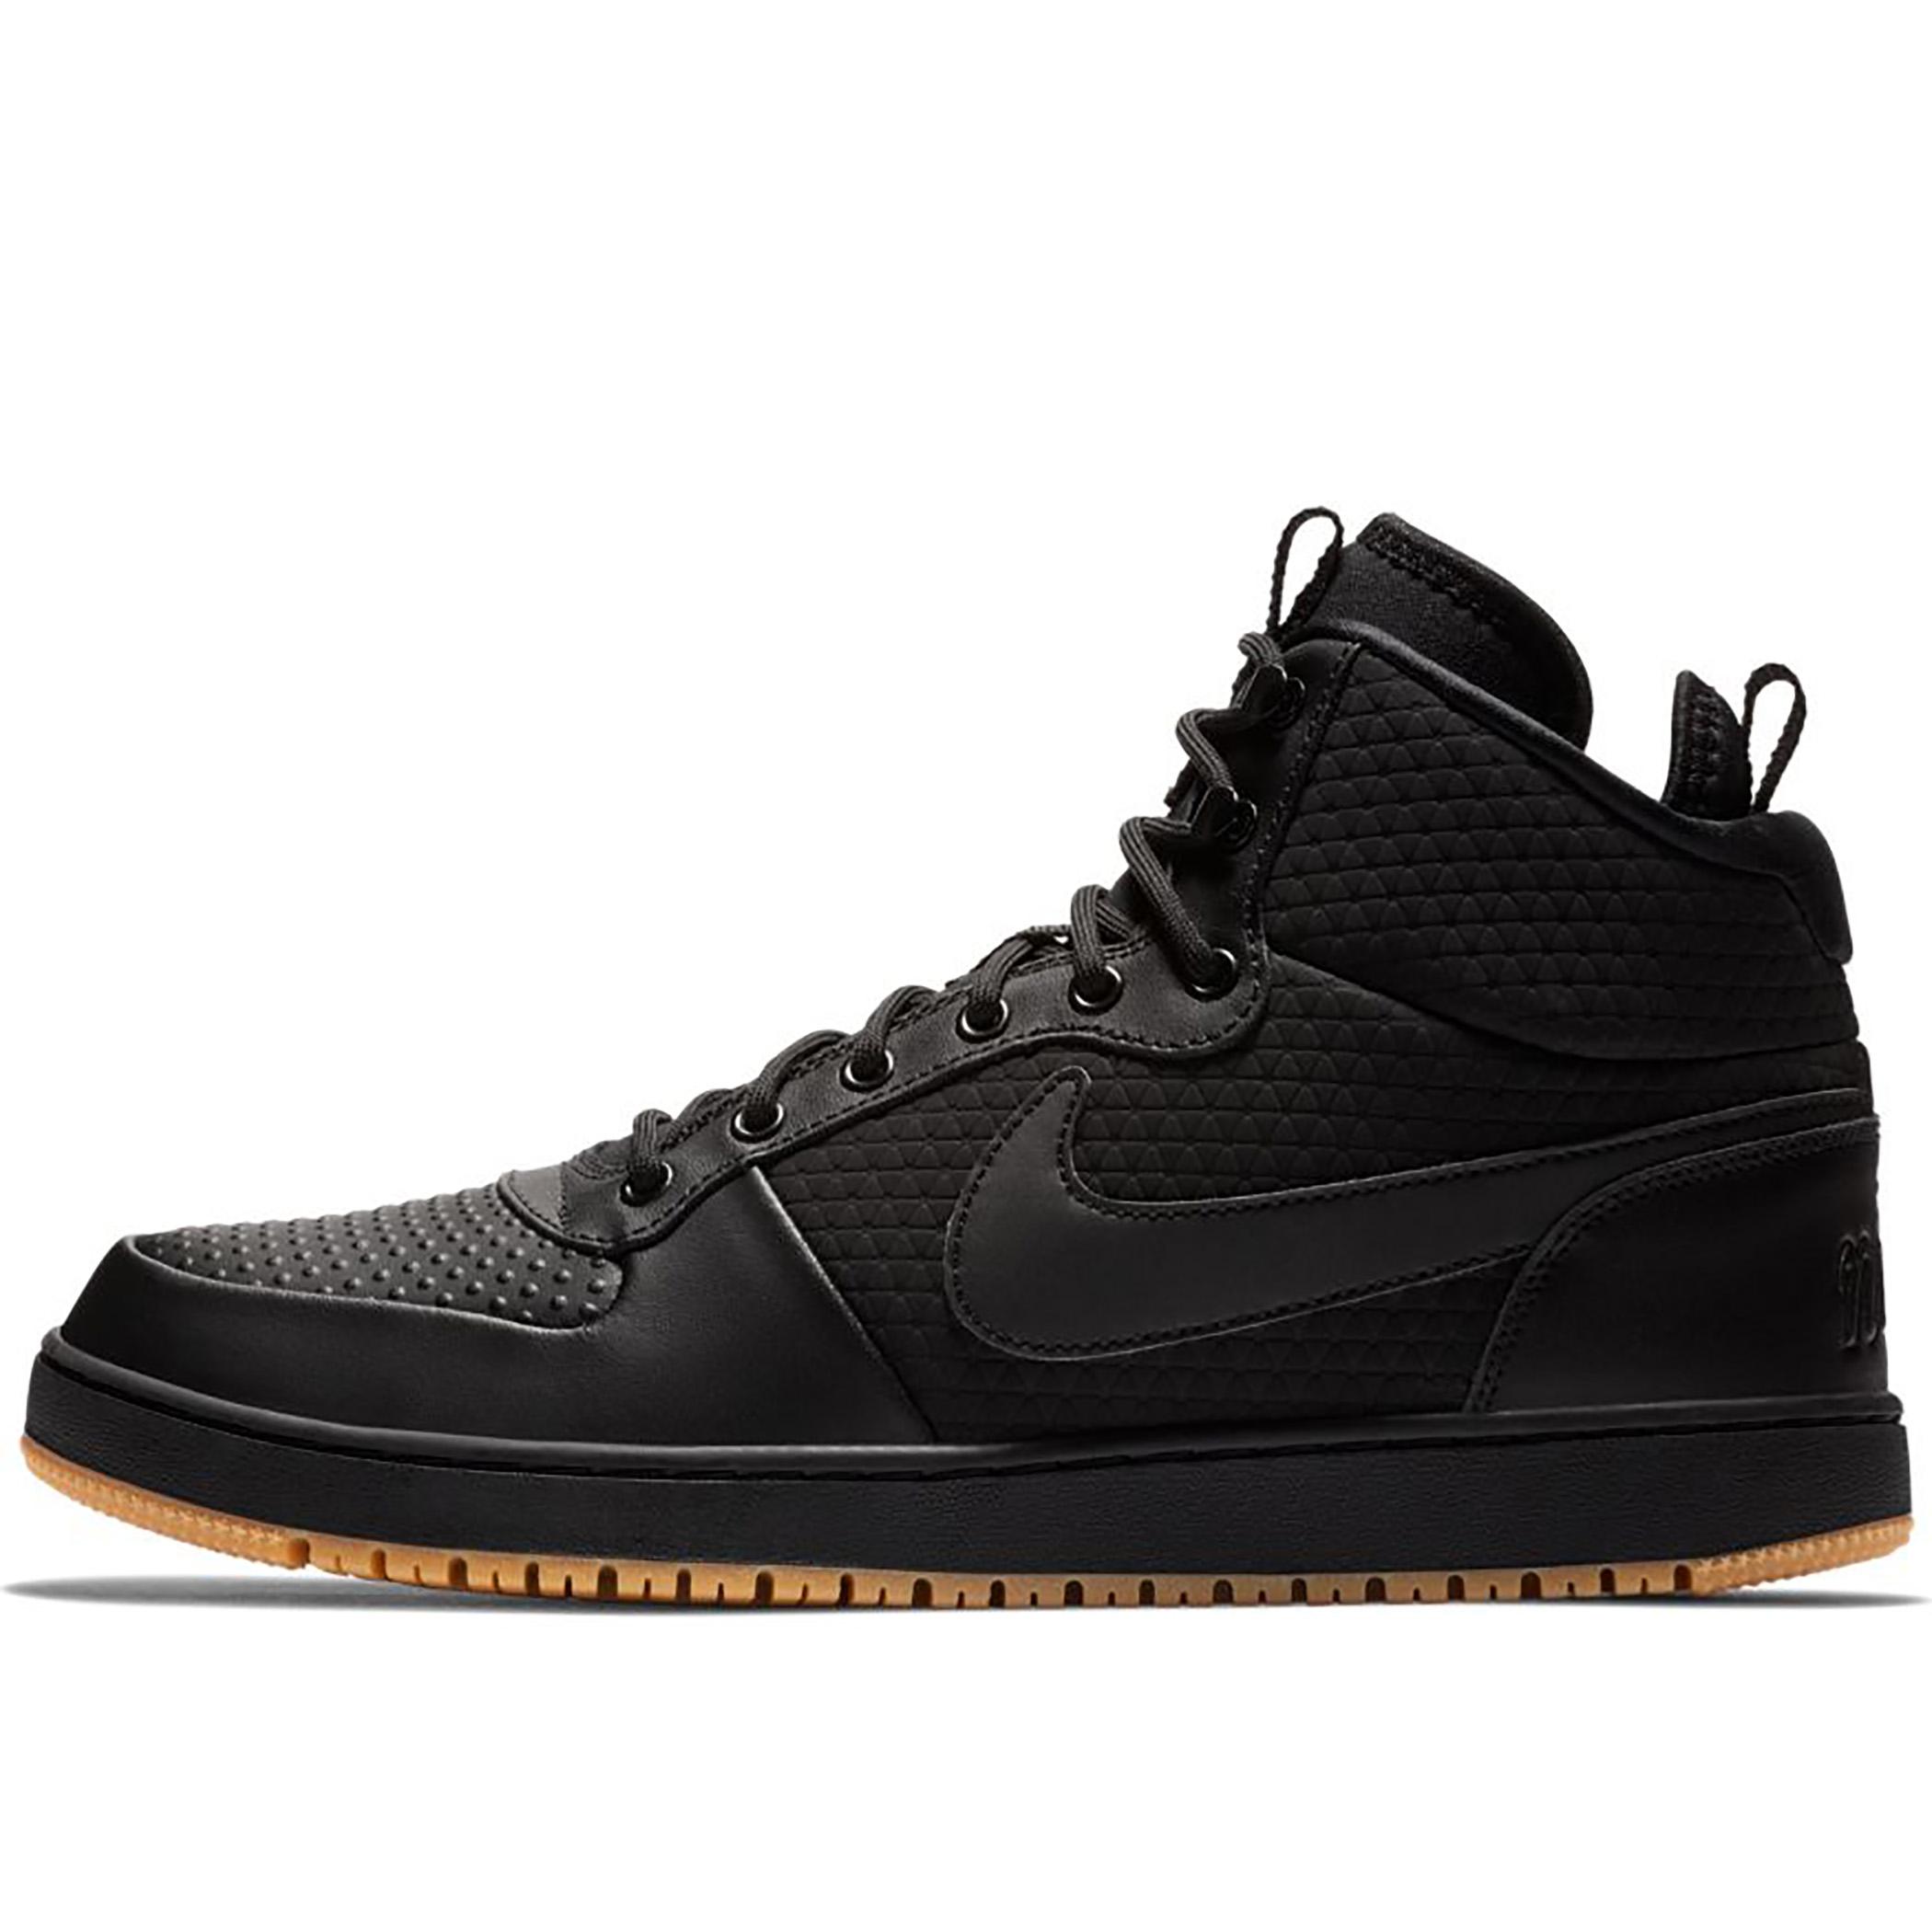 5ae00423 Мужские кроссовки Nike Ebernon MID Winter Black/Gum Light Brown - фото 1